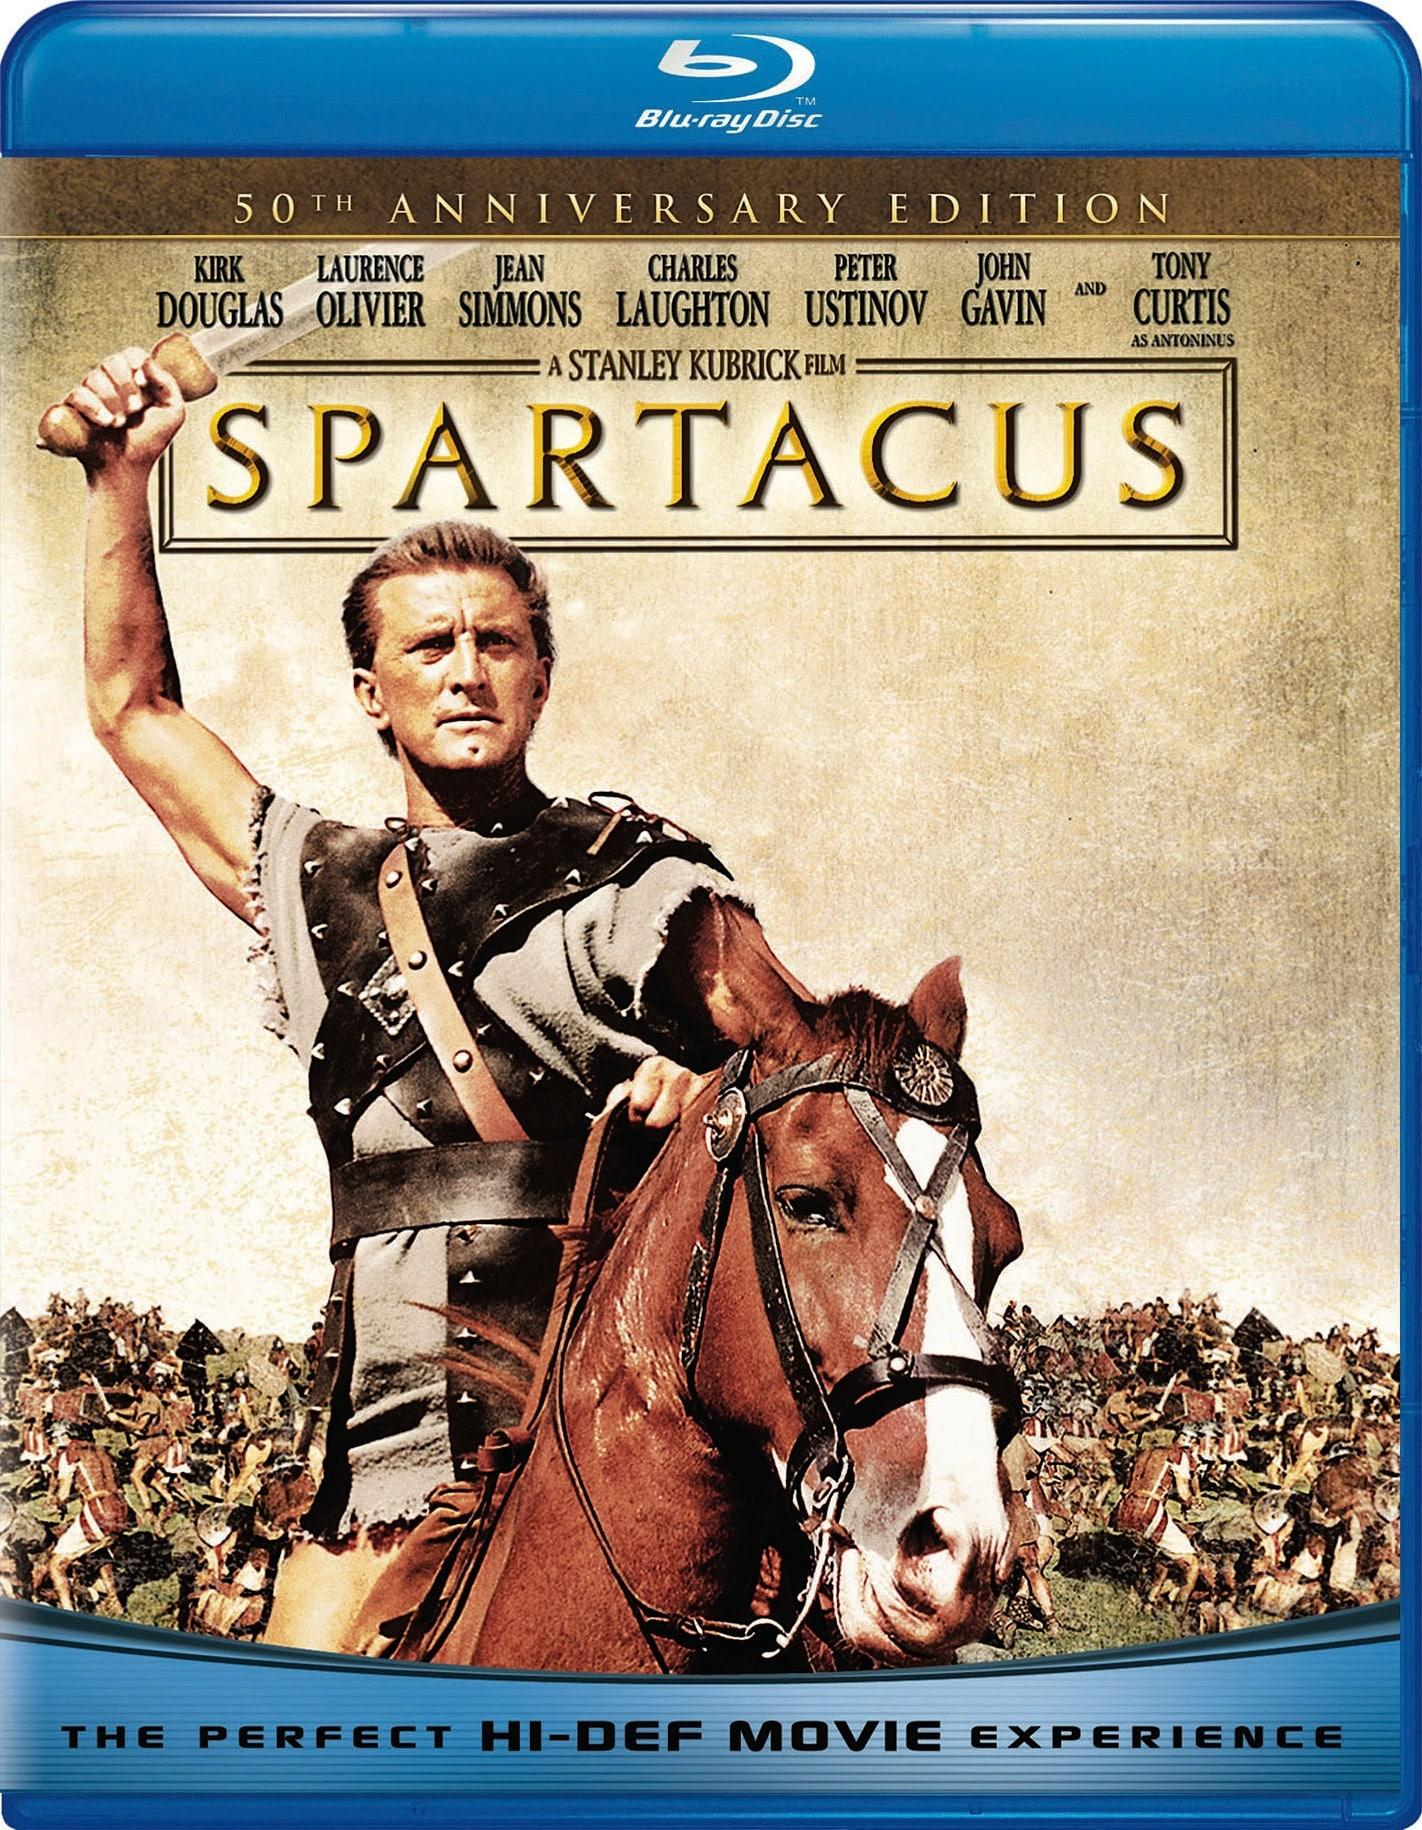 Spartacus (Blu-ray Disc)